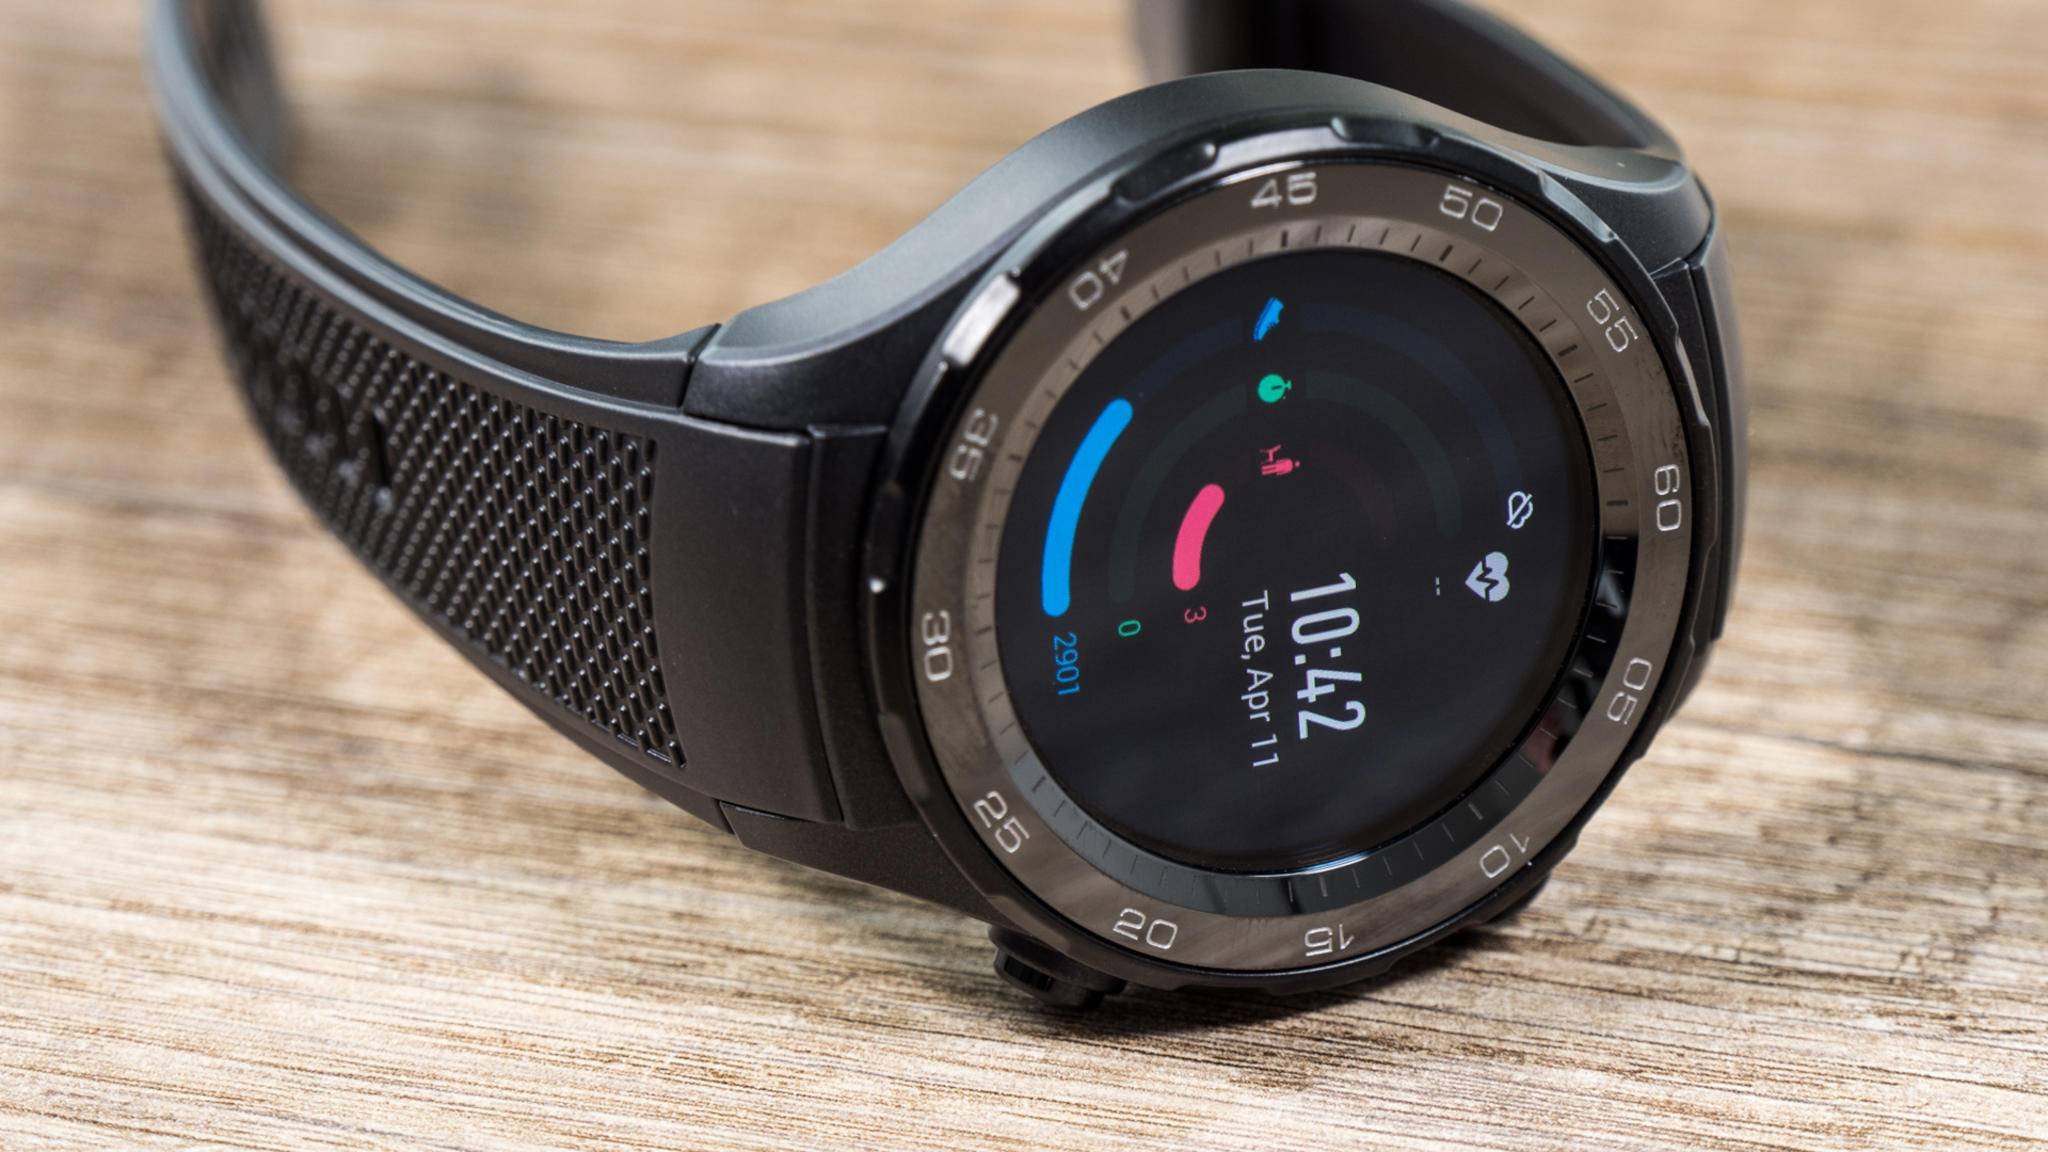 Die Huawei Watch 2 bekommt auch Android 8.0 Oreo.